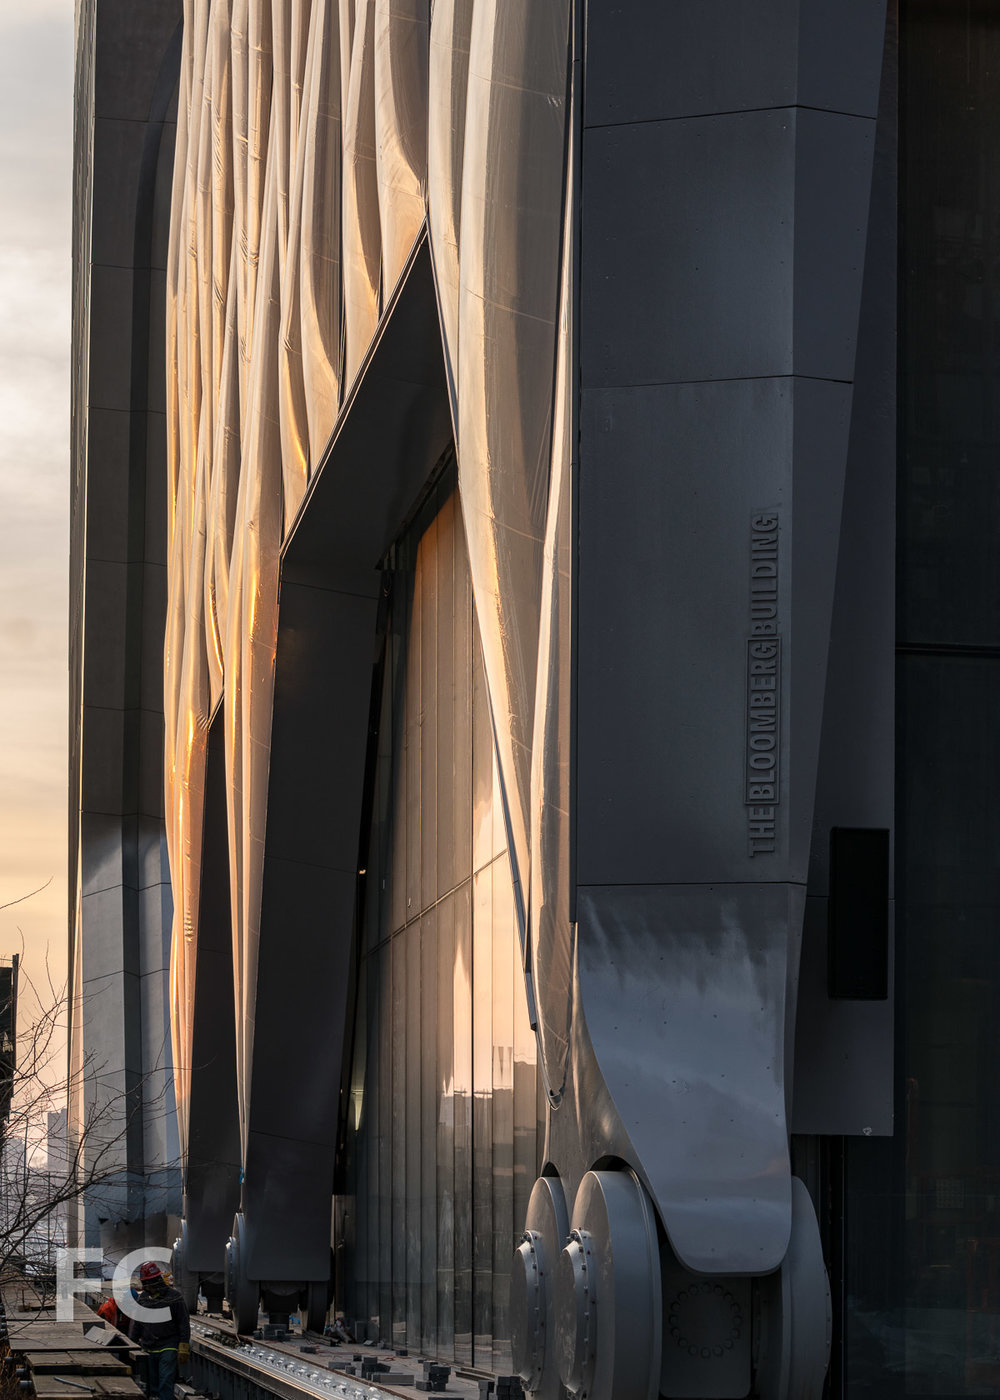 2019_03_30-The Shed at Hudson Yards-DSC09582.jpg